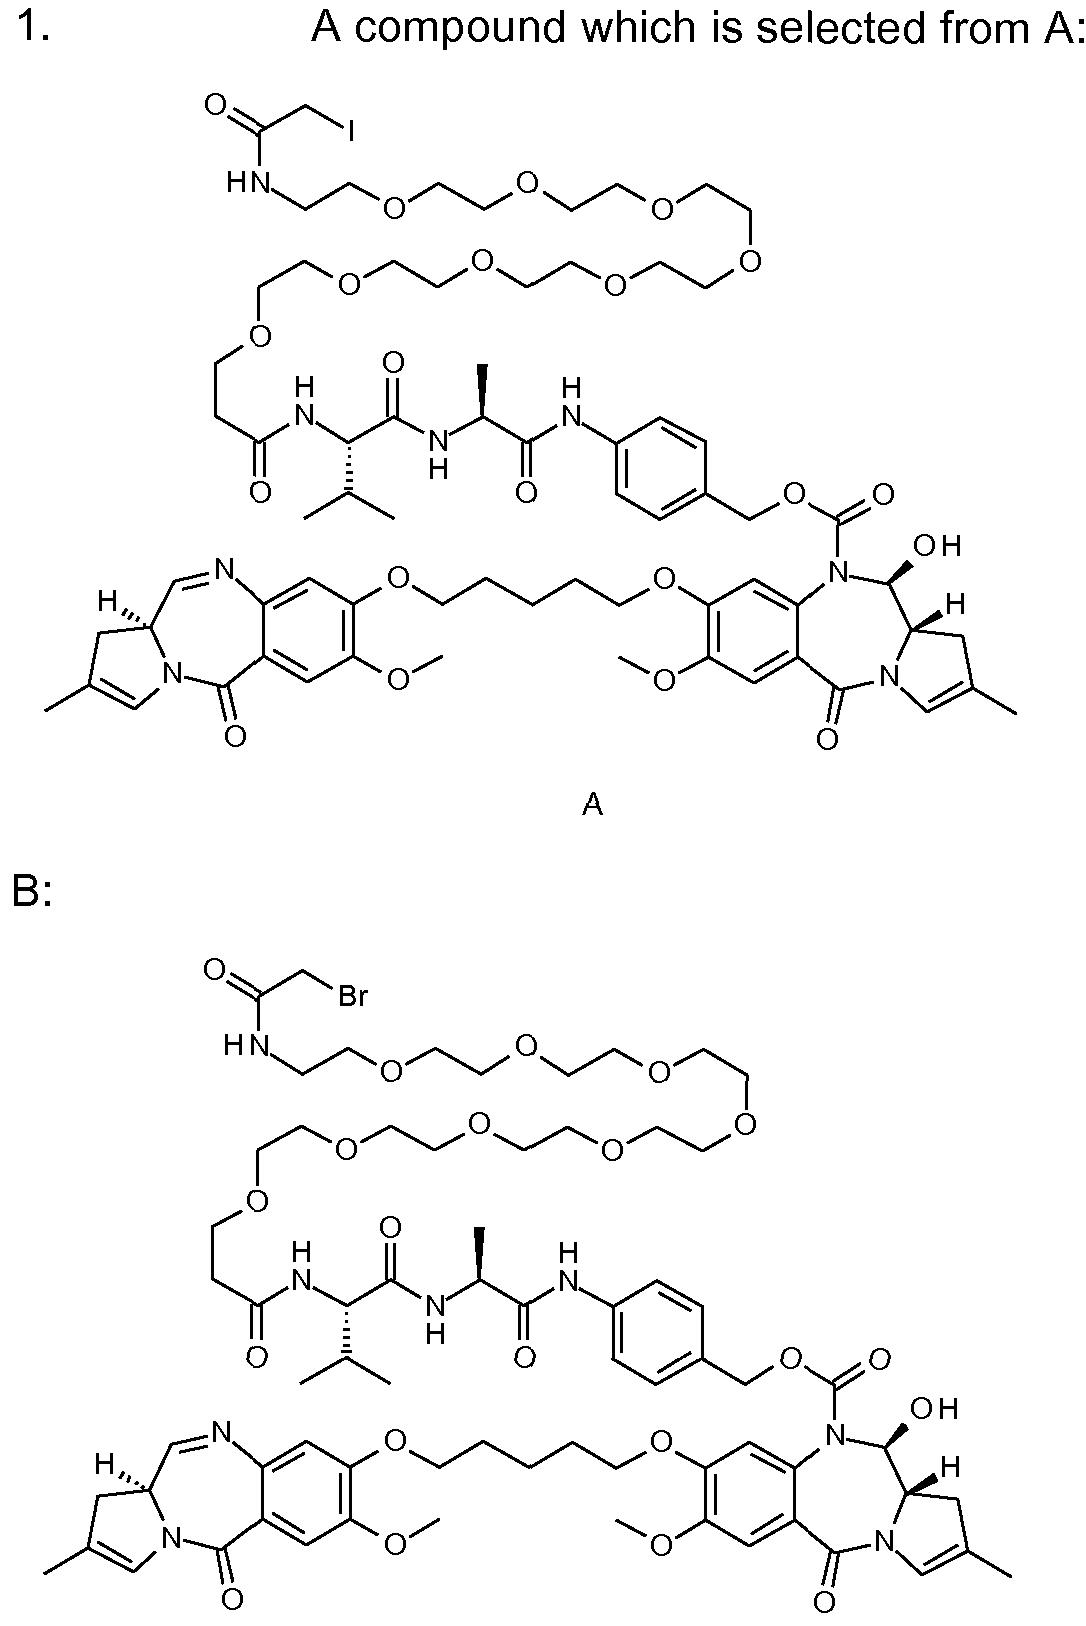 Abp 656 wo2015052322a1 - pyrrolobenzodiazepines and conjugates